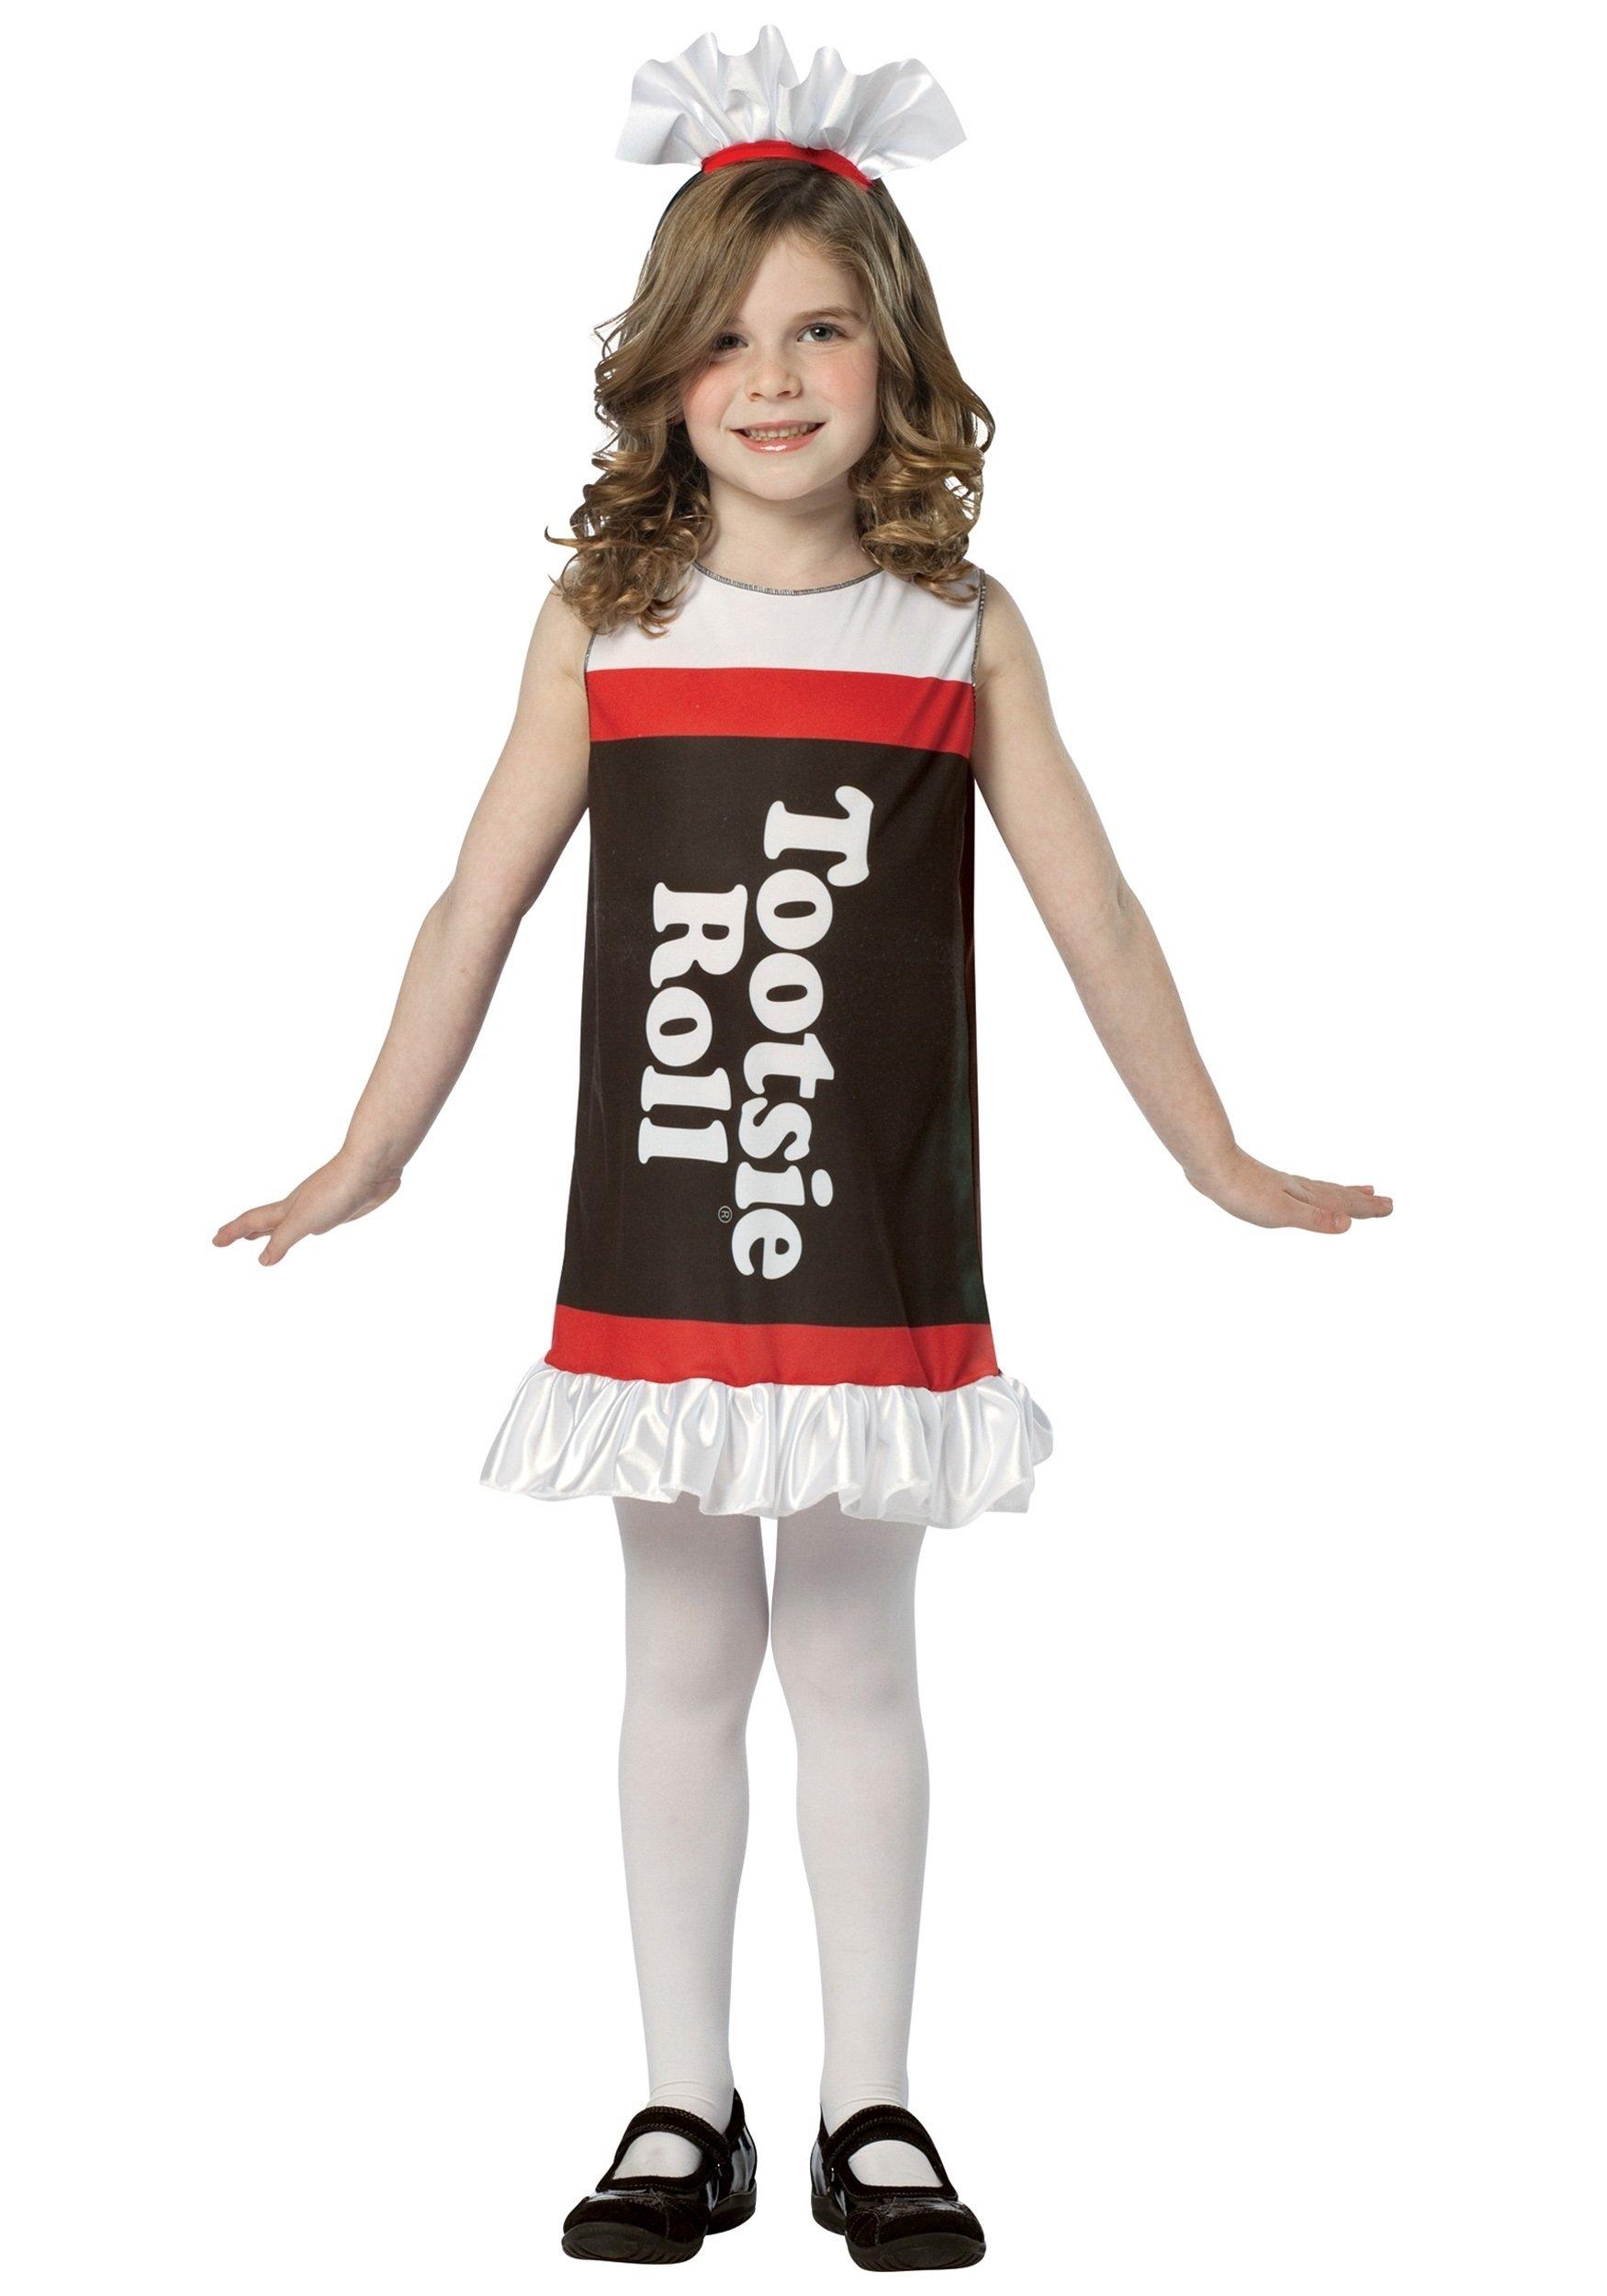 10 Lovable Boy Girl Halloween Costume Ideas girls tootsie roll dress 14 2021